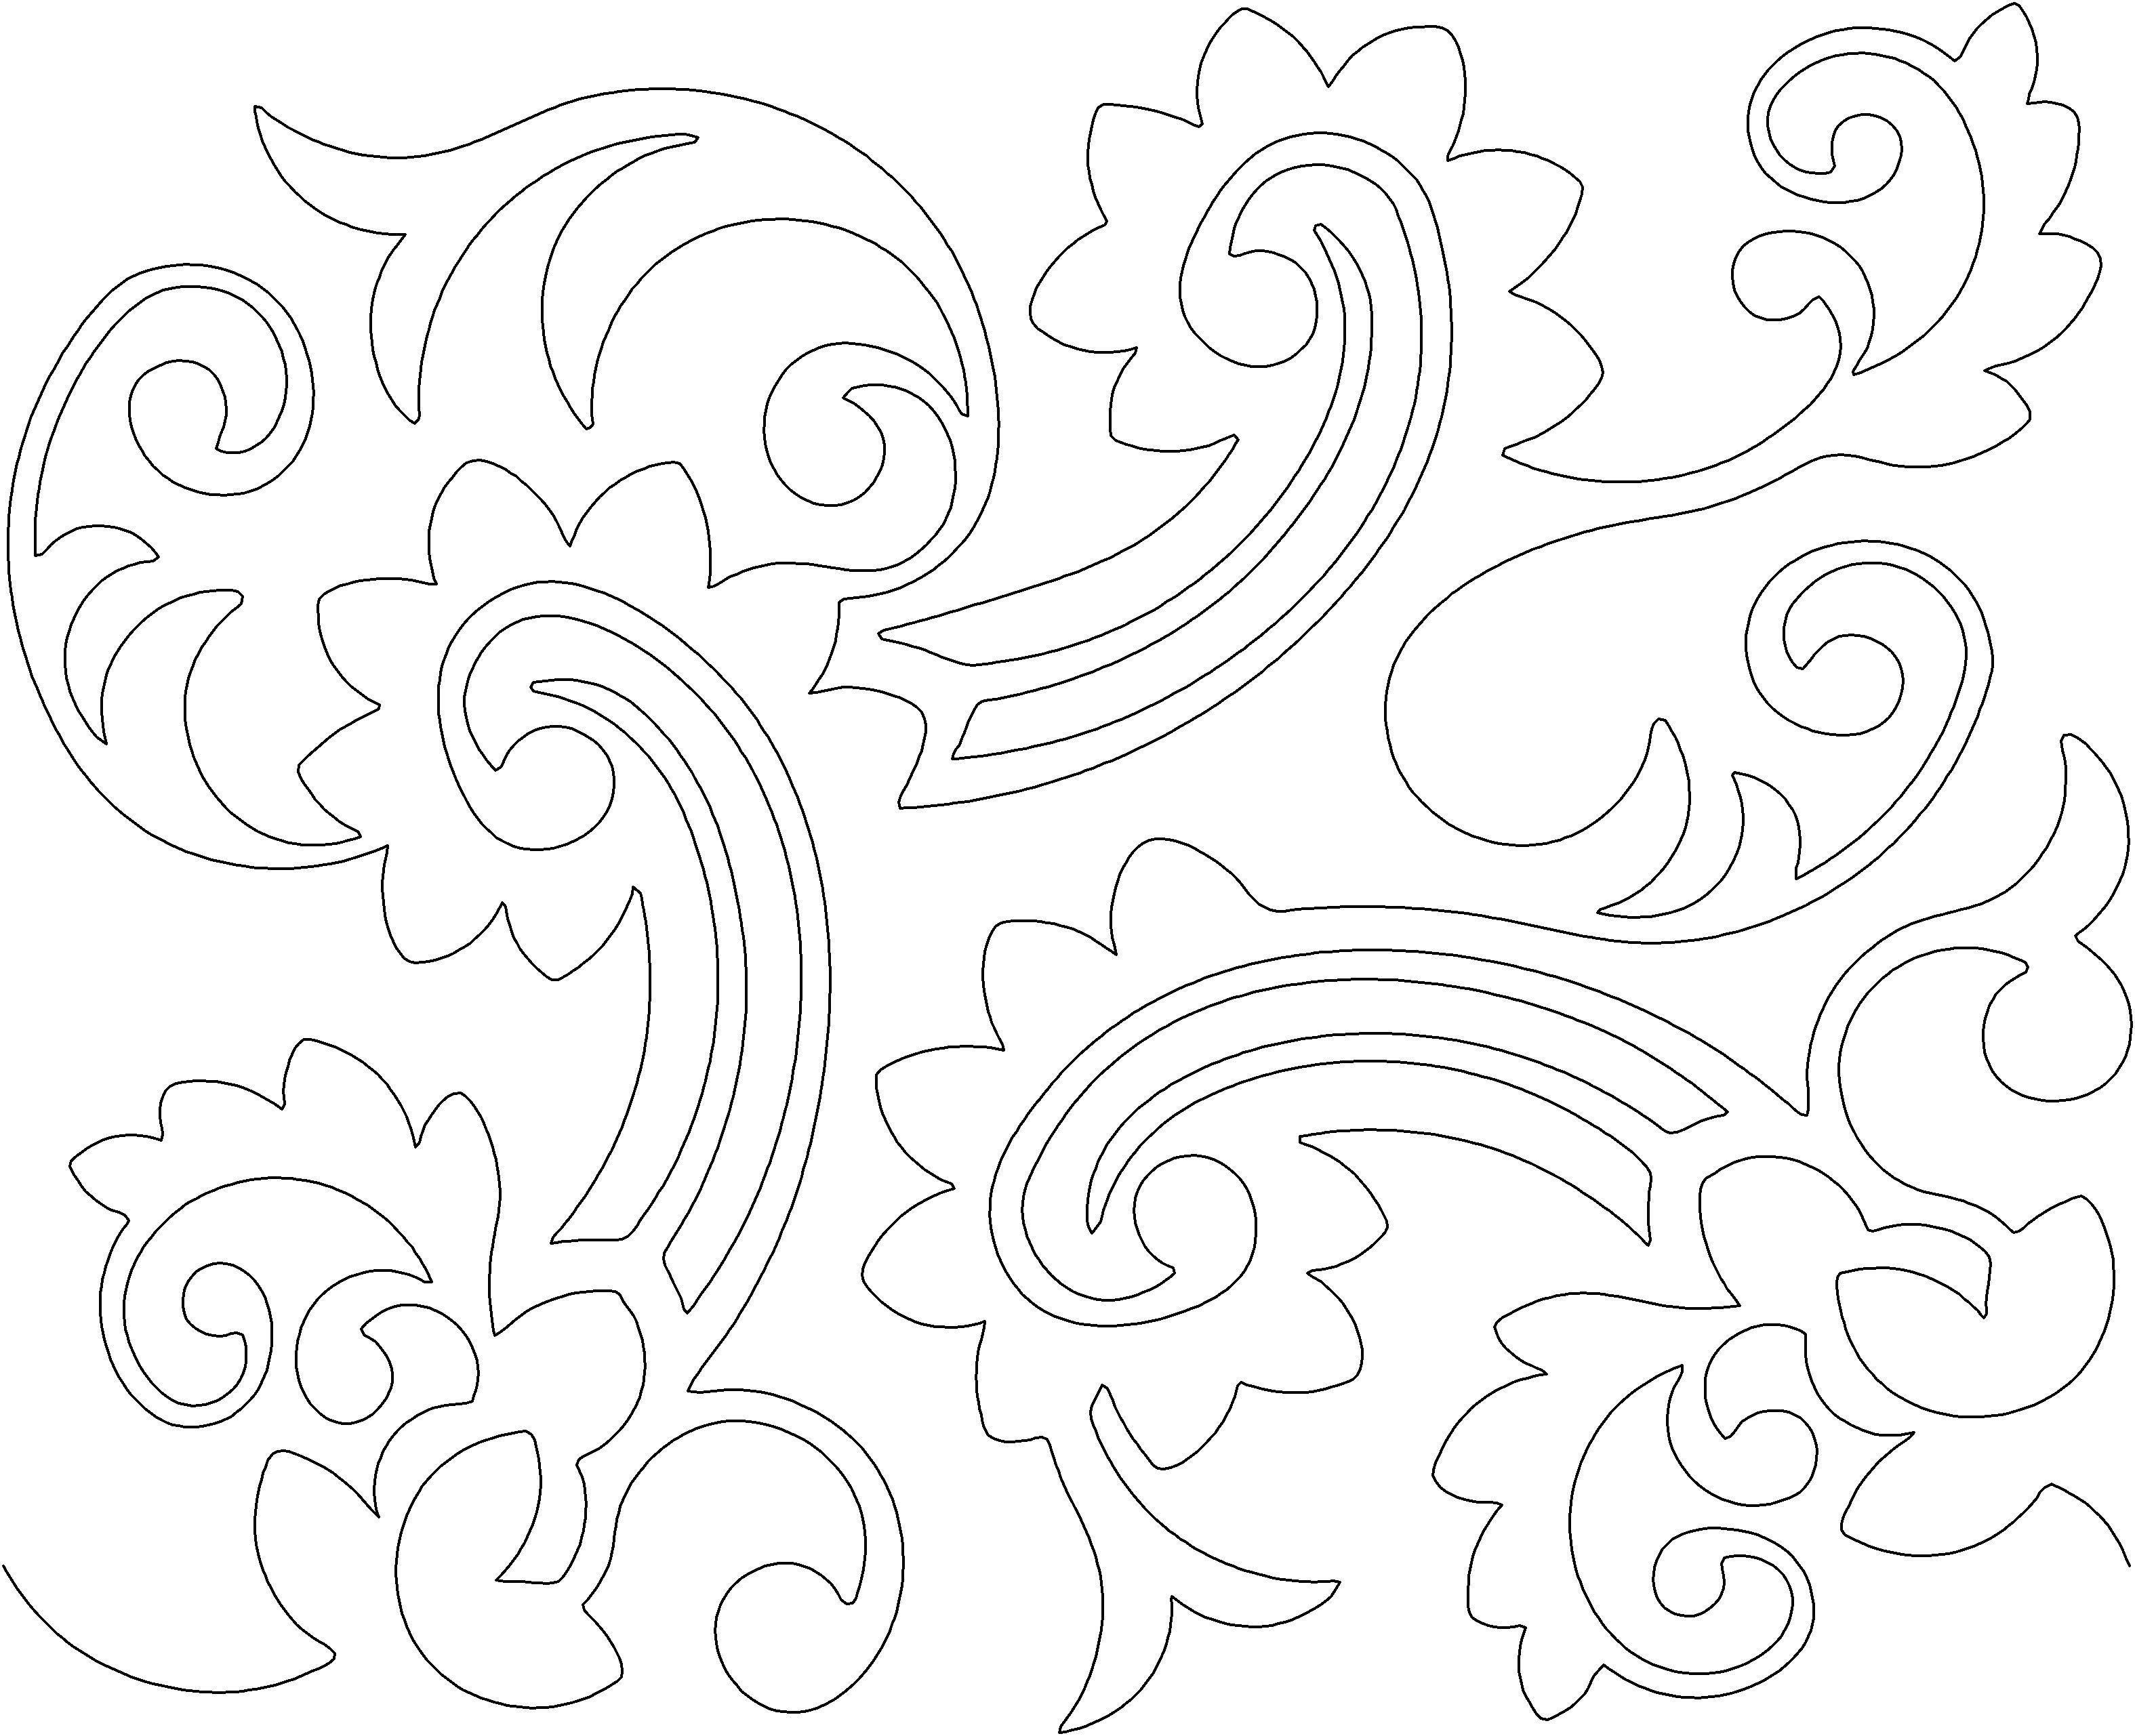 Paisley sun swirls curls longarm quilt patterns pinterest